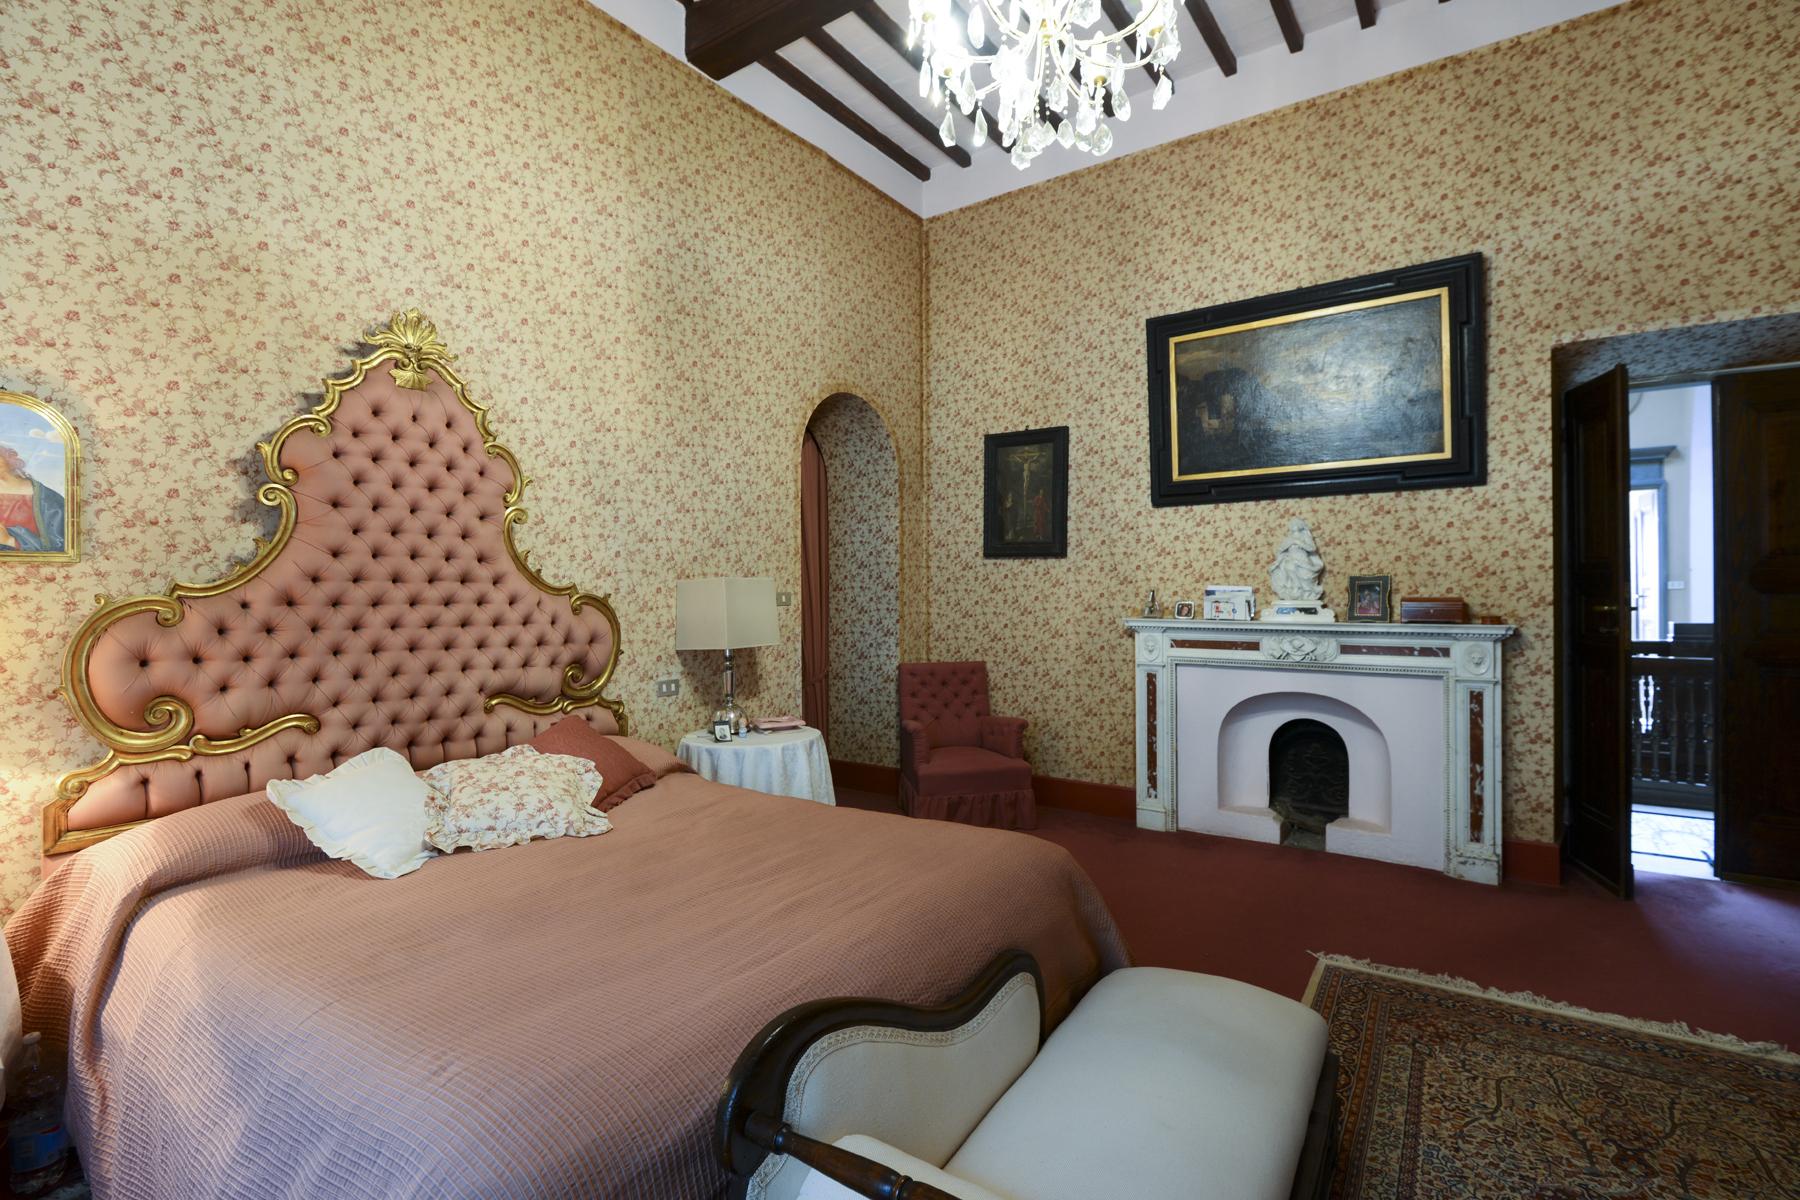 Villa in Vendita a Casciana Terme Lari: 5 locali, 1800 mq - Foto 9